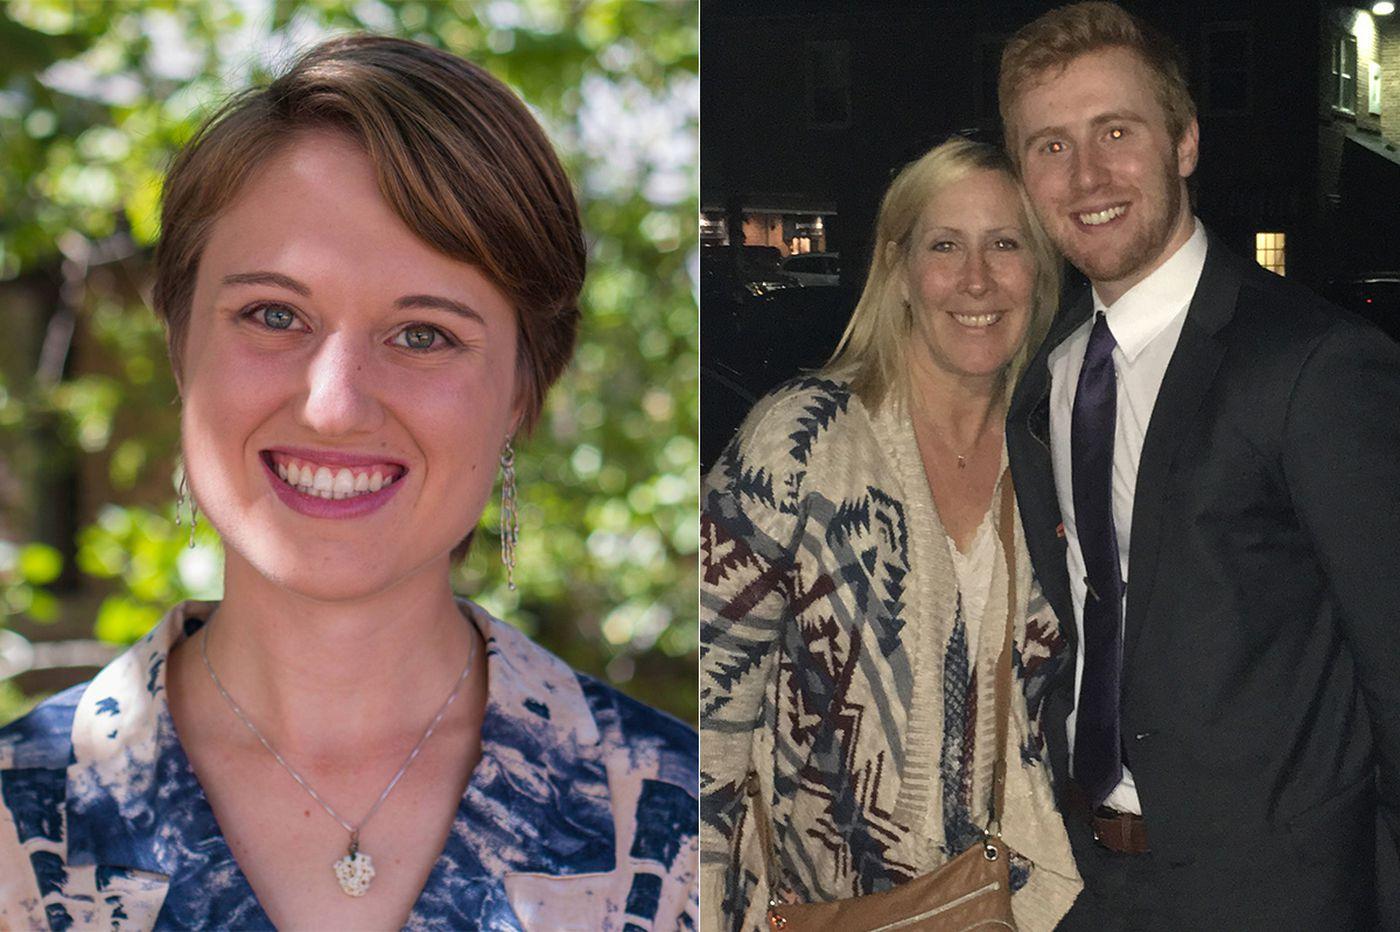 Two Philadelphia-area students score prestigious Rhodes Scholarships